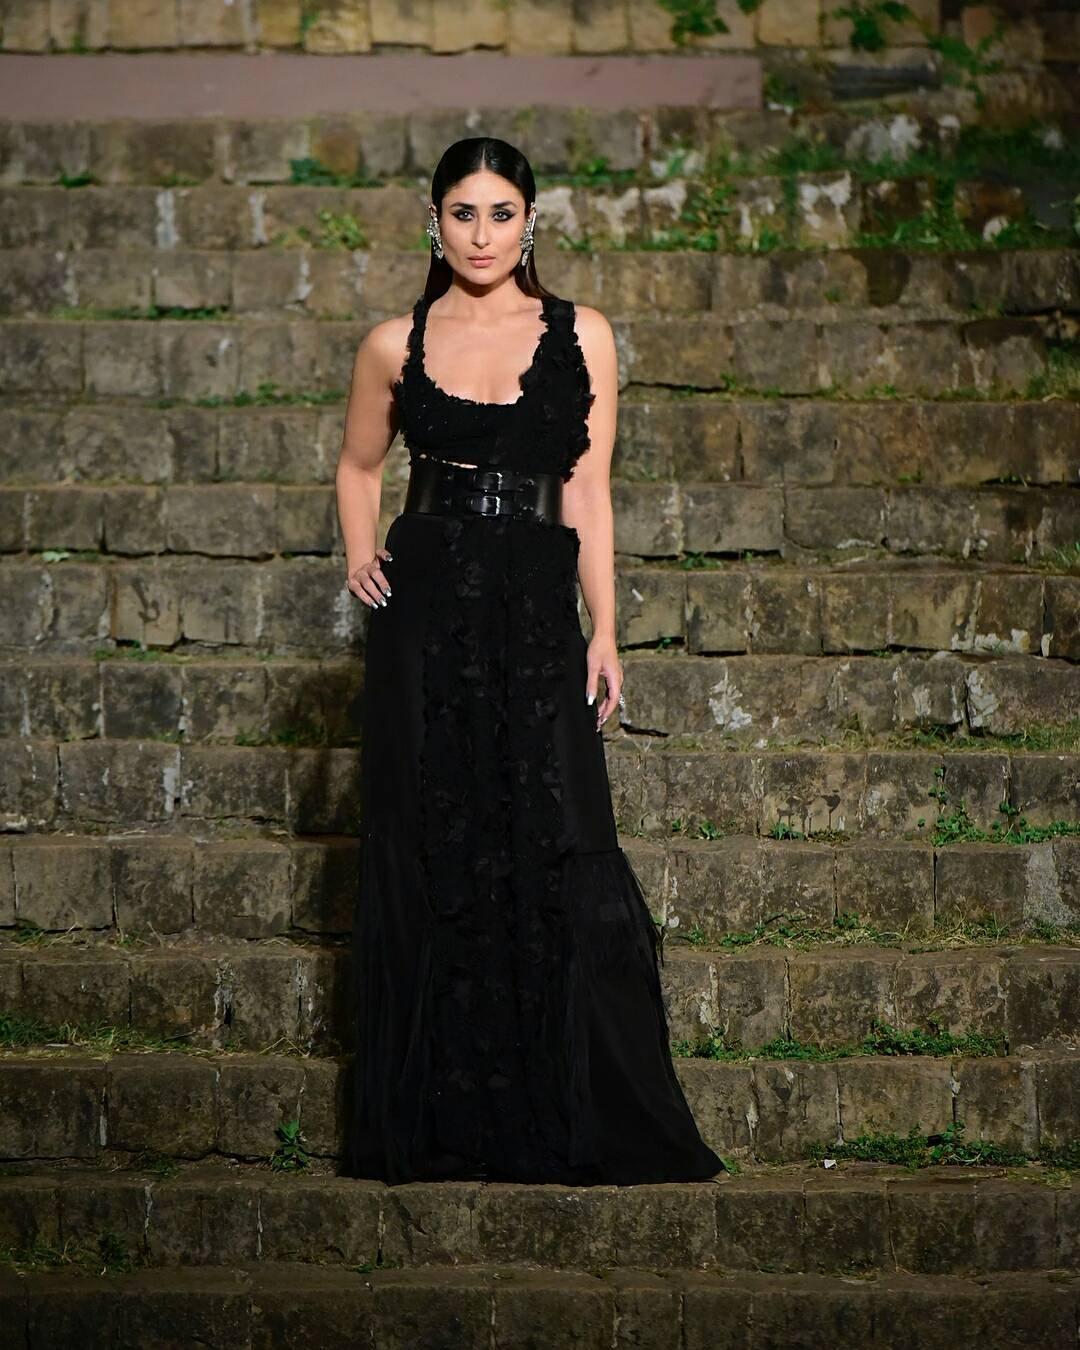 Lakme Fashion Week Summer Resort 2018, Lakme Fashion Week, Bridal Saree, Bollywood Fashion, Anamika Khanna, Kareena Kapoor, Kareena Kapoor Khan, Bridal Gown